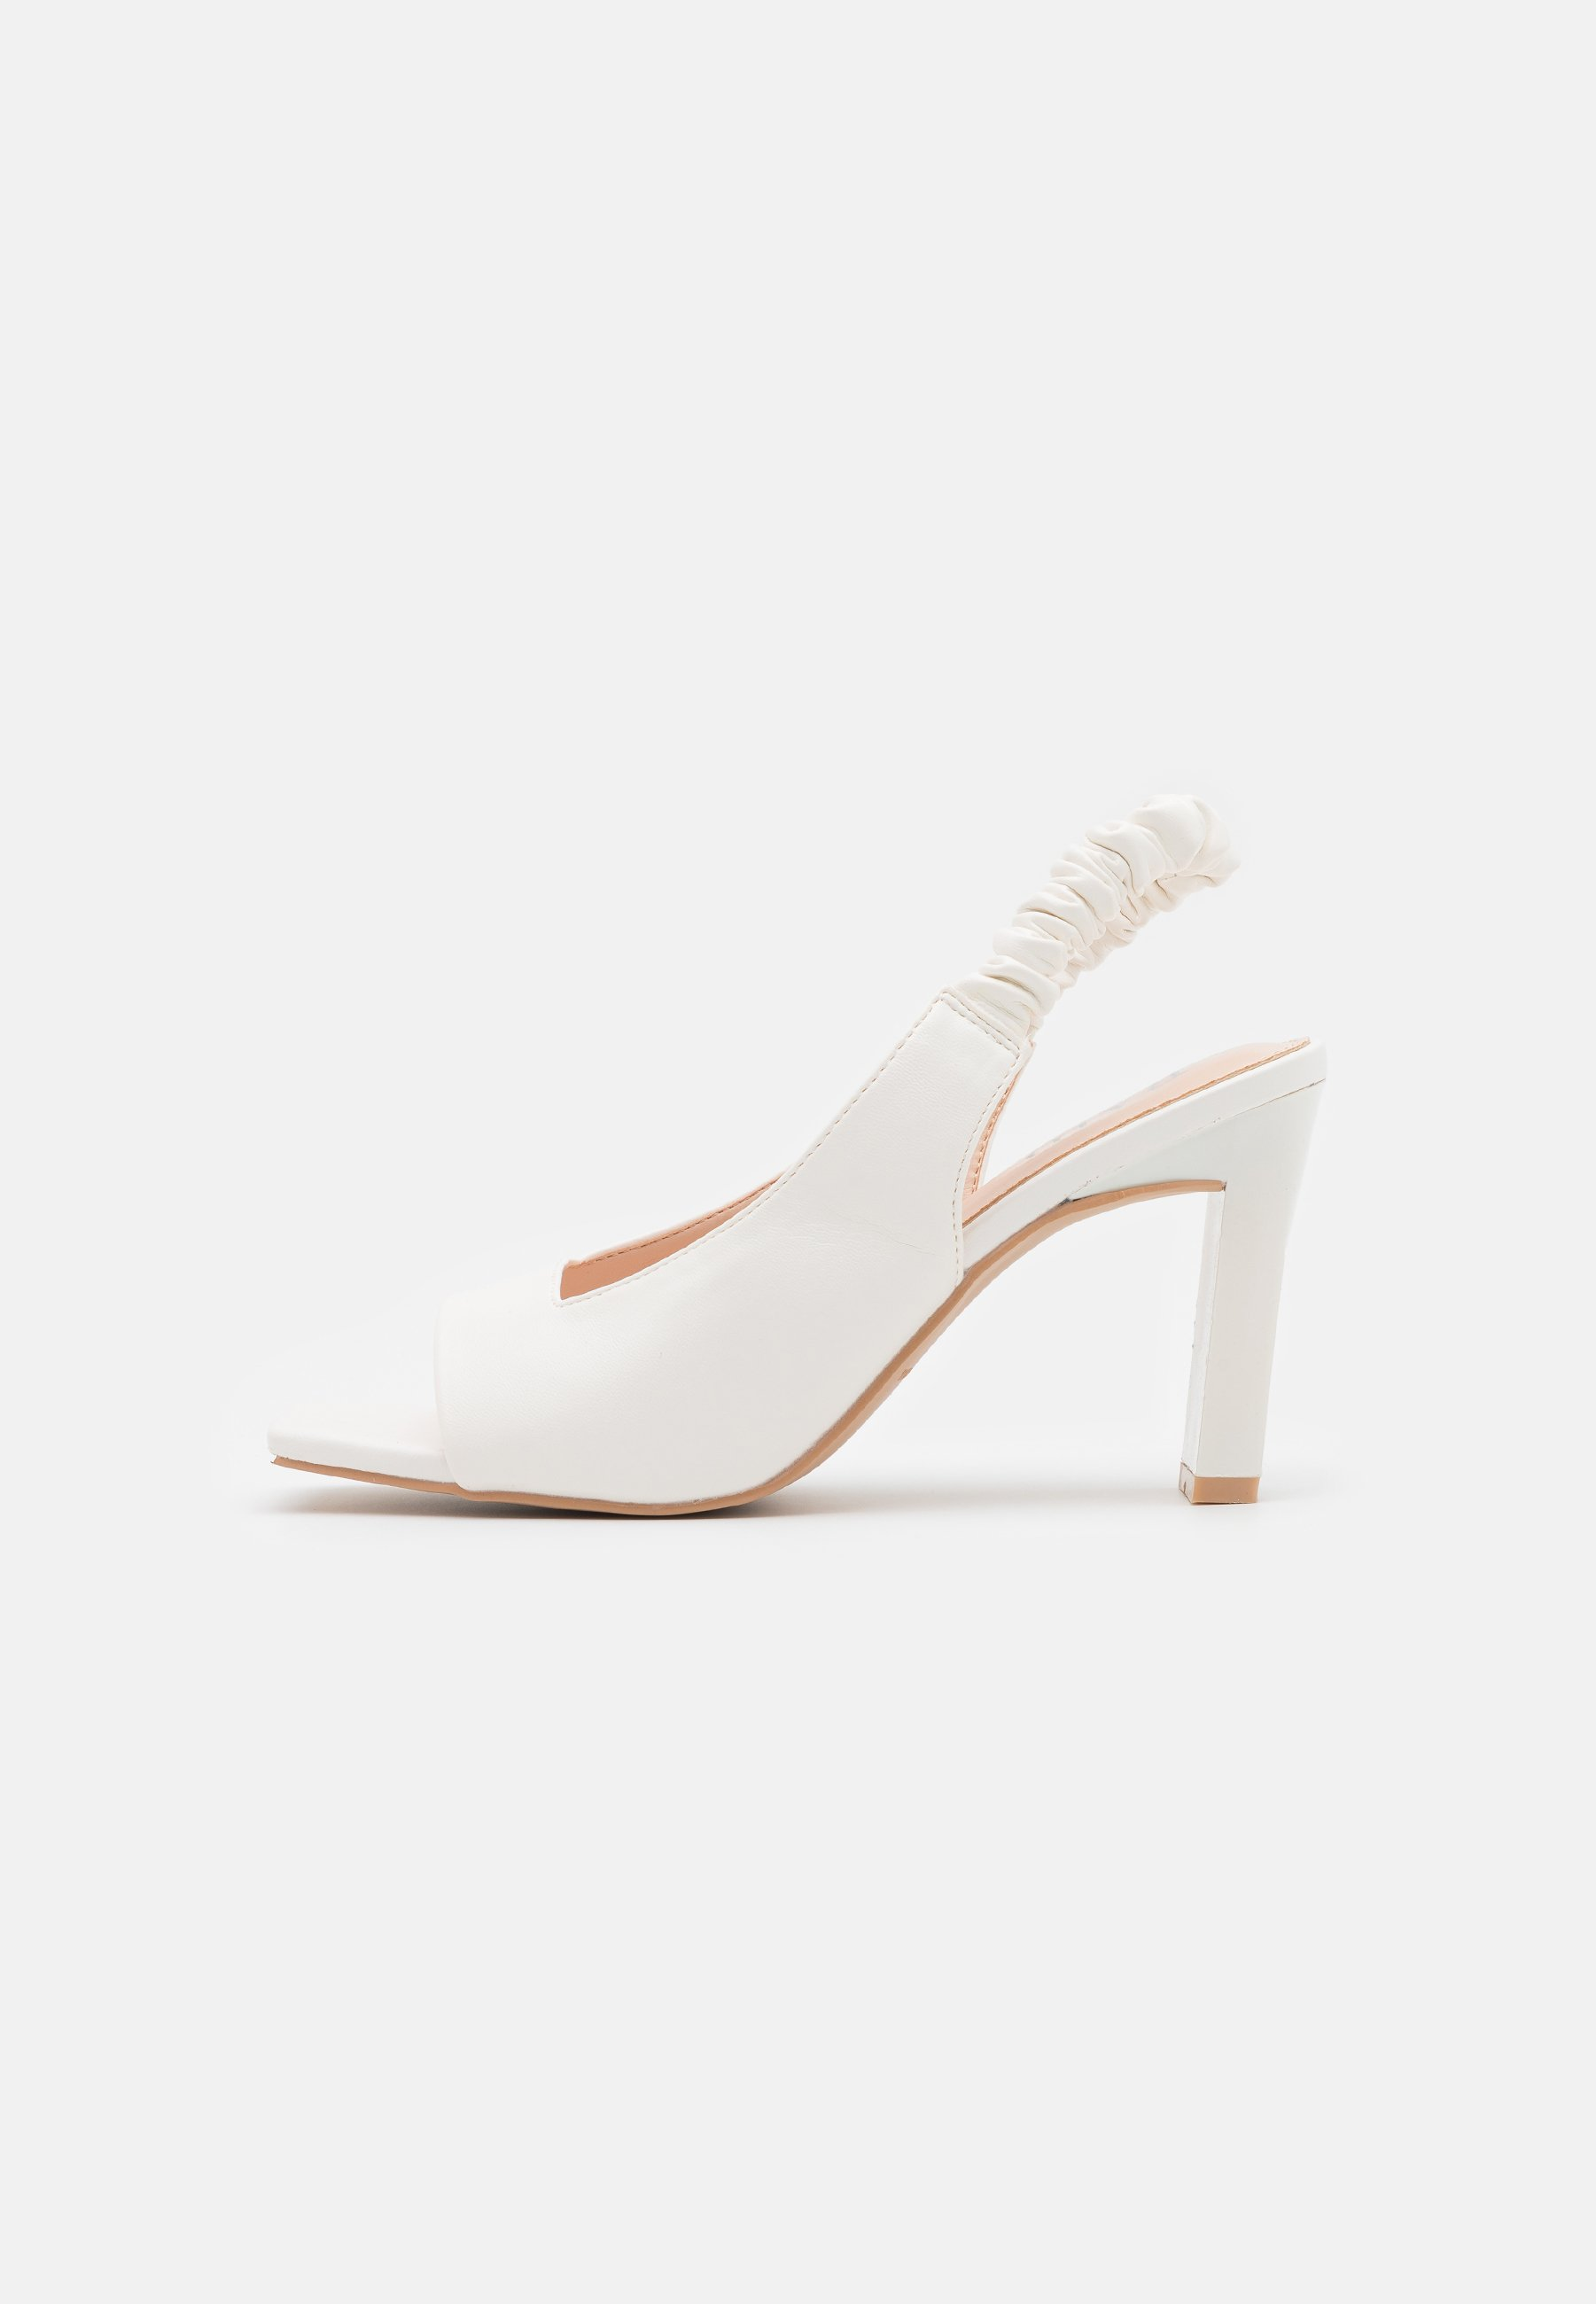 Women GALICIA - Sandals - white